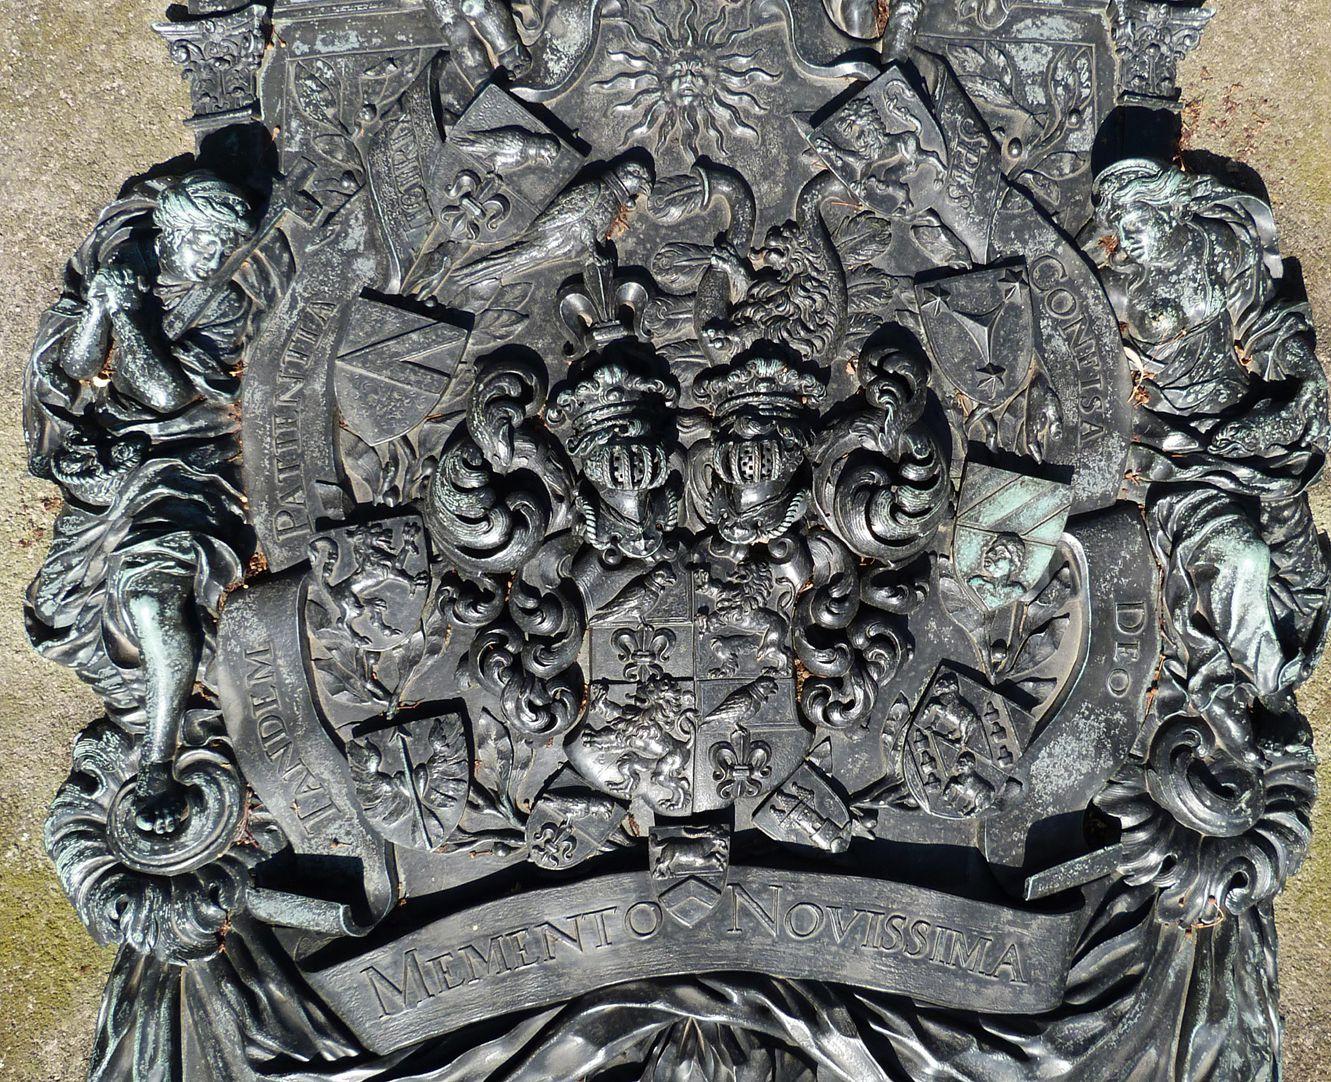 Epitaph des Andreas Georg Paumgarten zentrales Wappenfeld